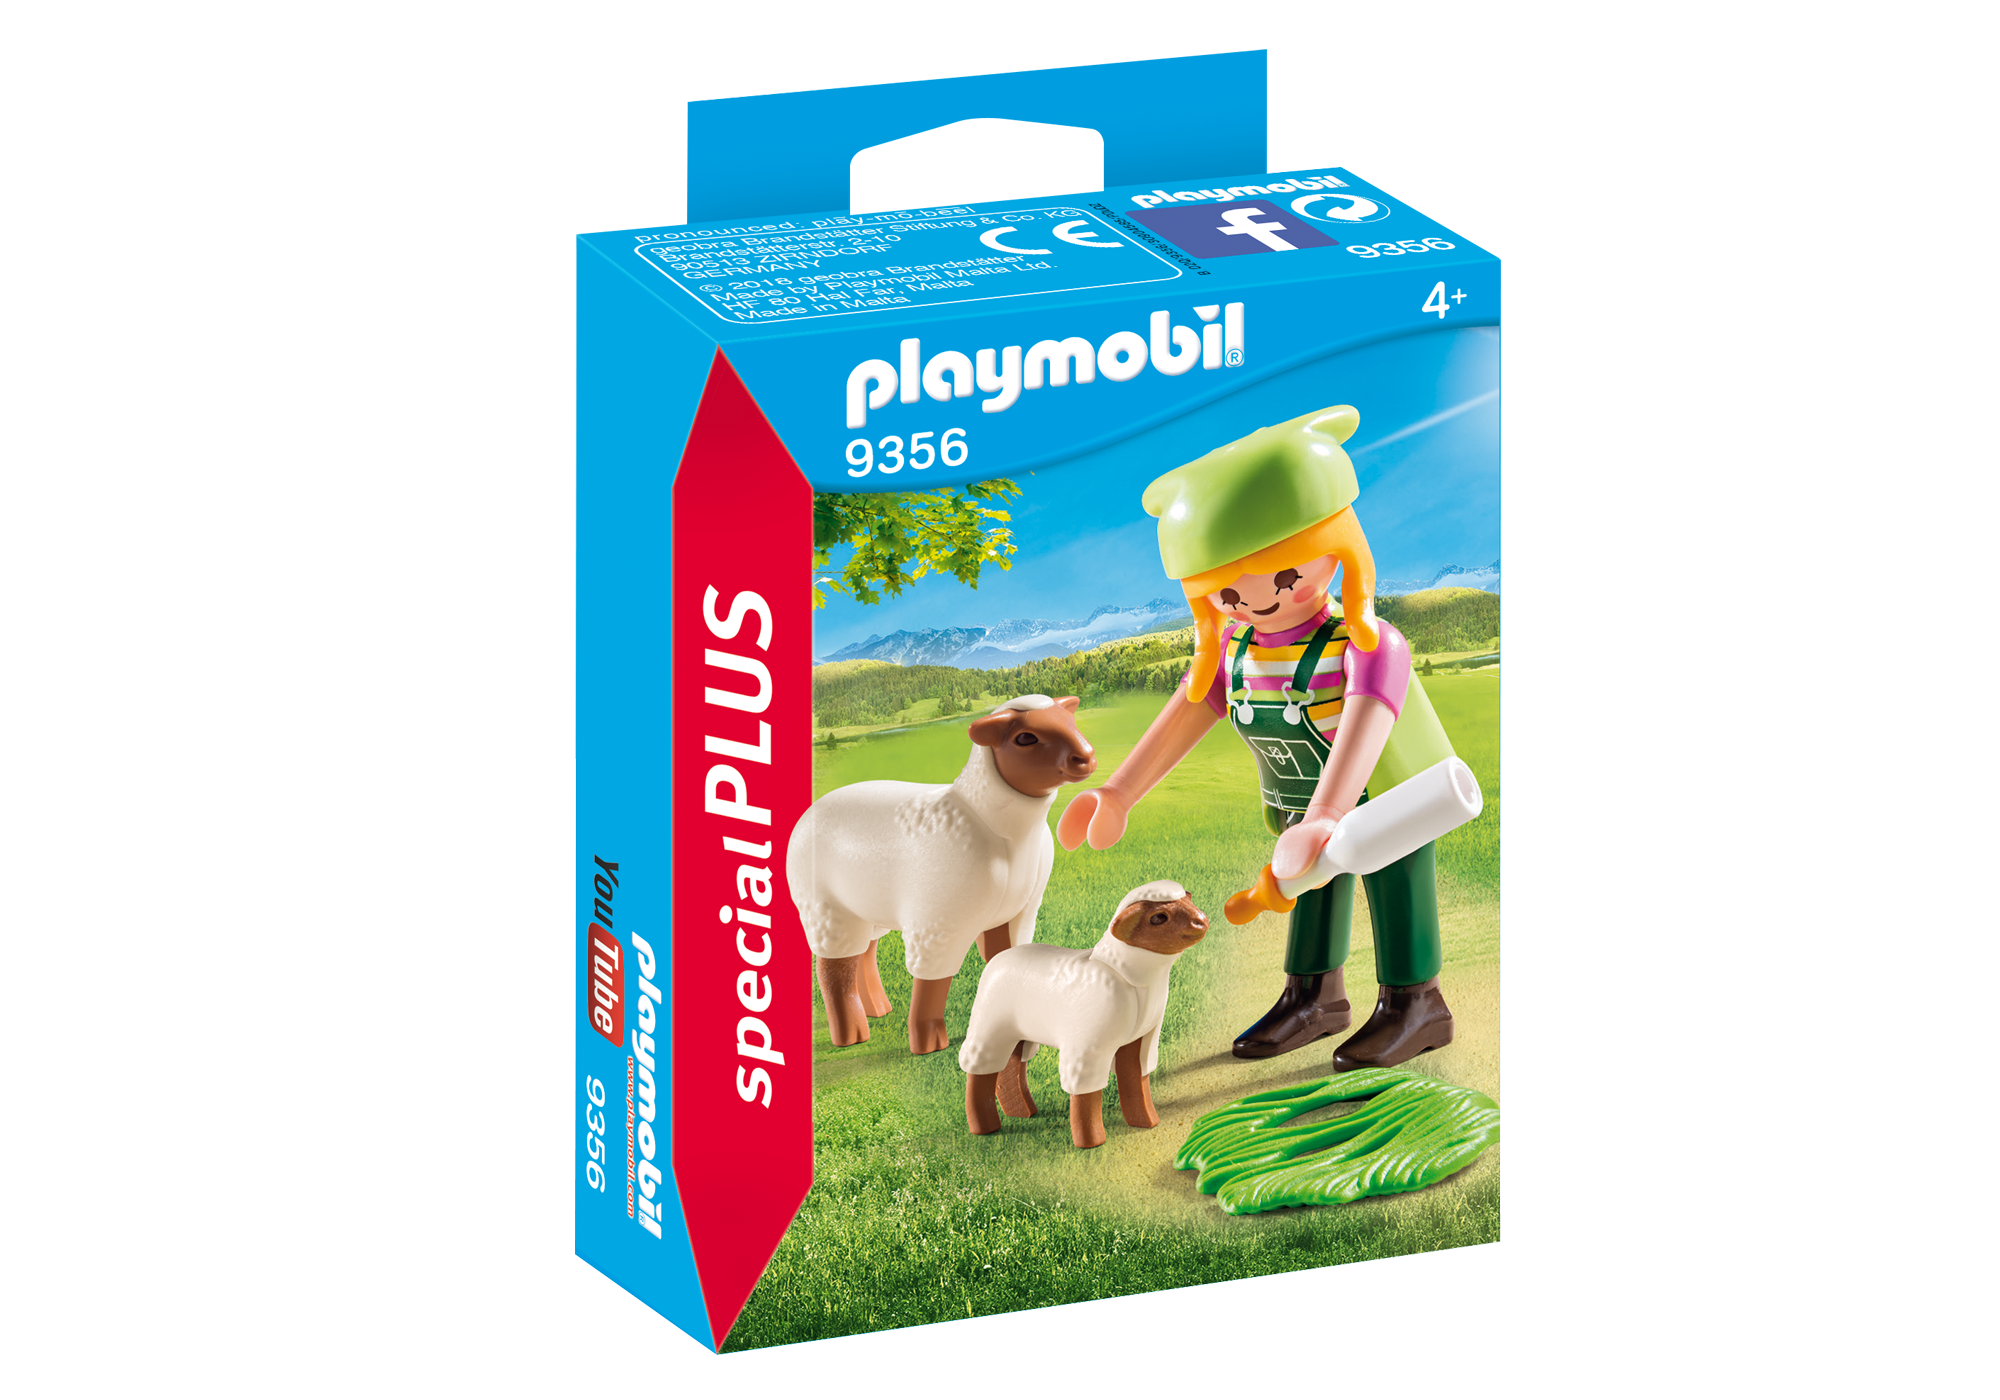 http://media.playmobil.com/i/playmobil/9356_product_box_front/Bäuerin mit Schäfchen